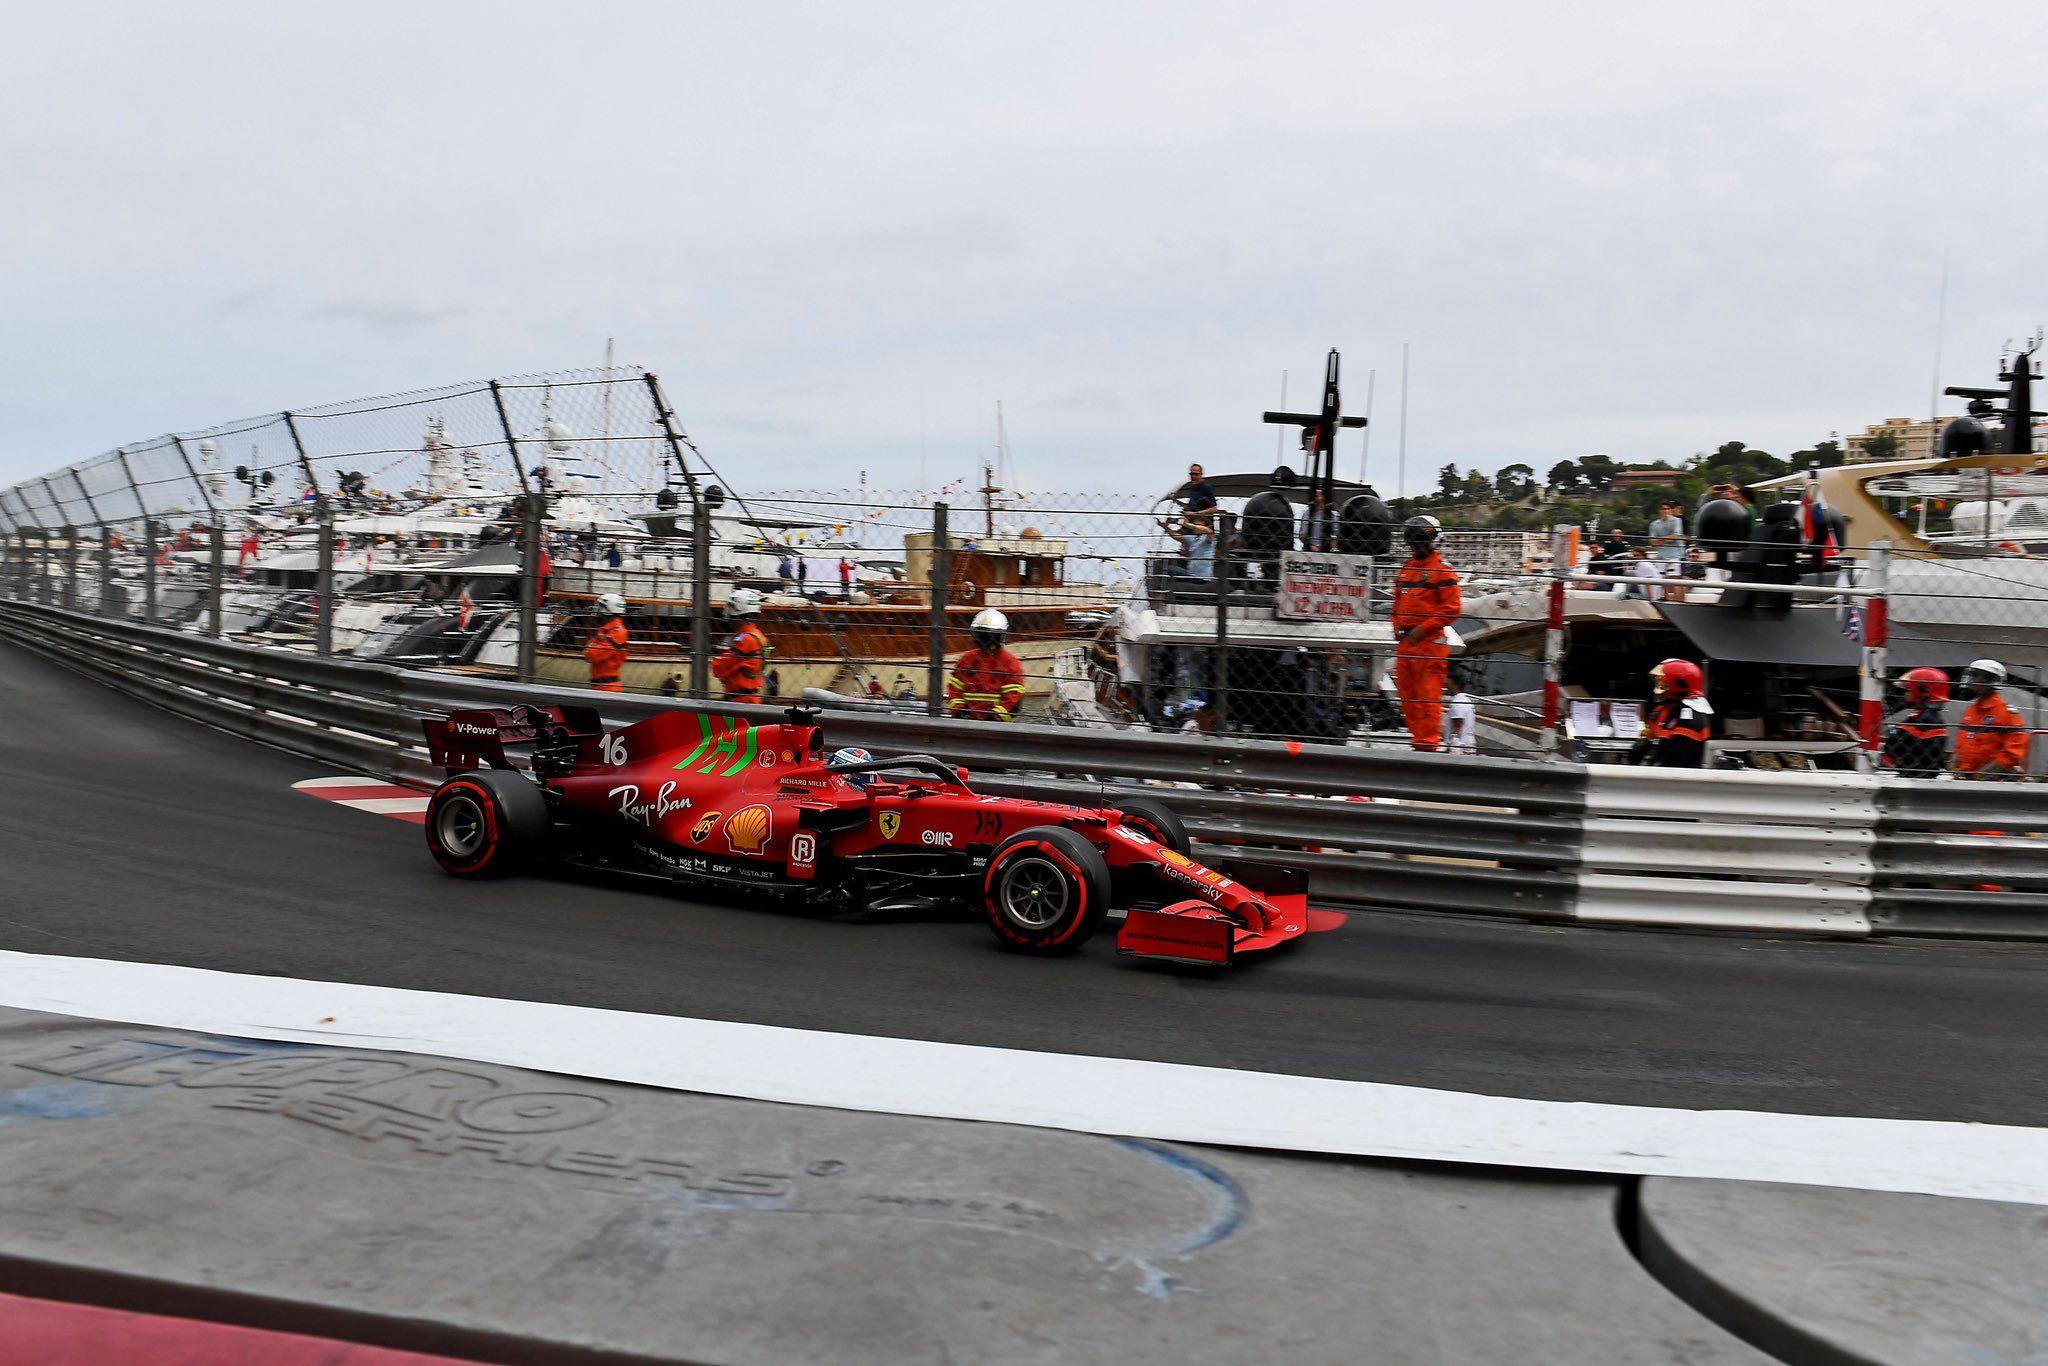 F1, Monaco GP, Charles Leclerc